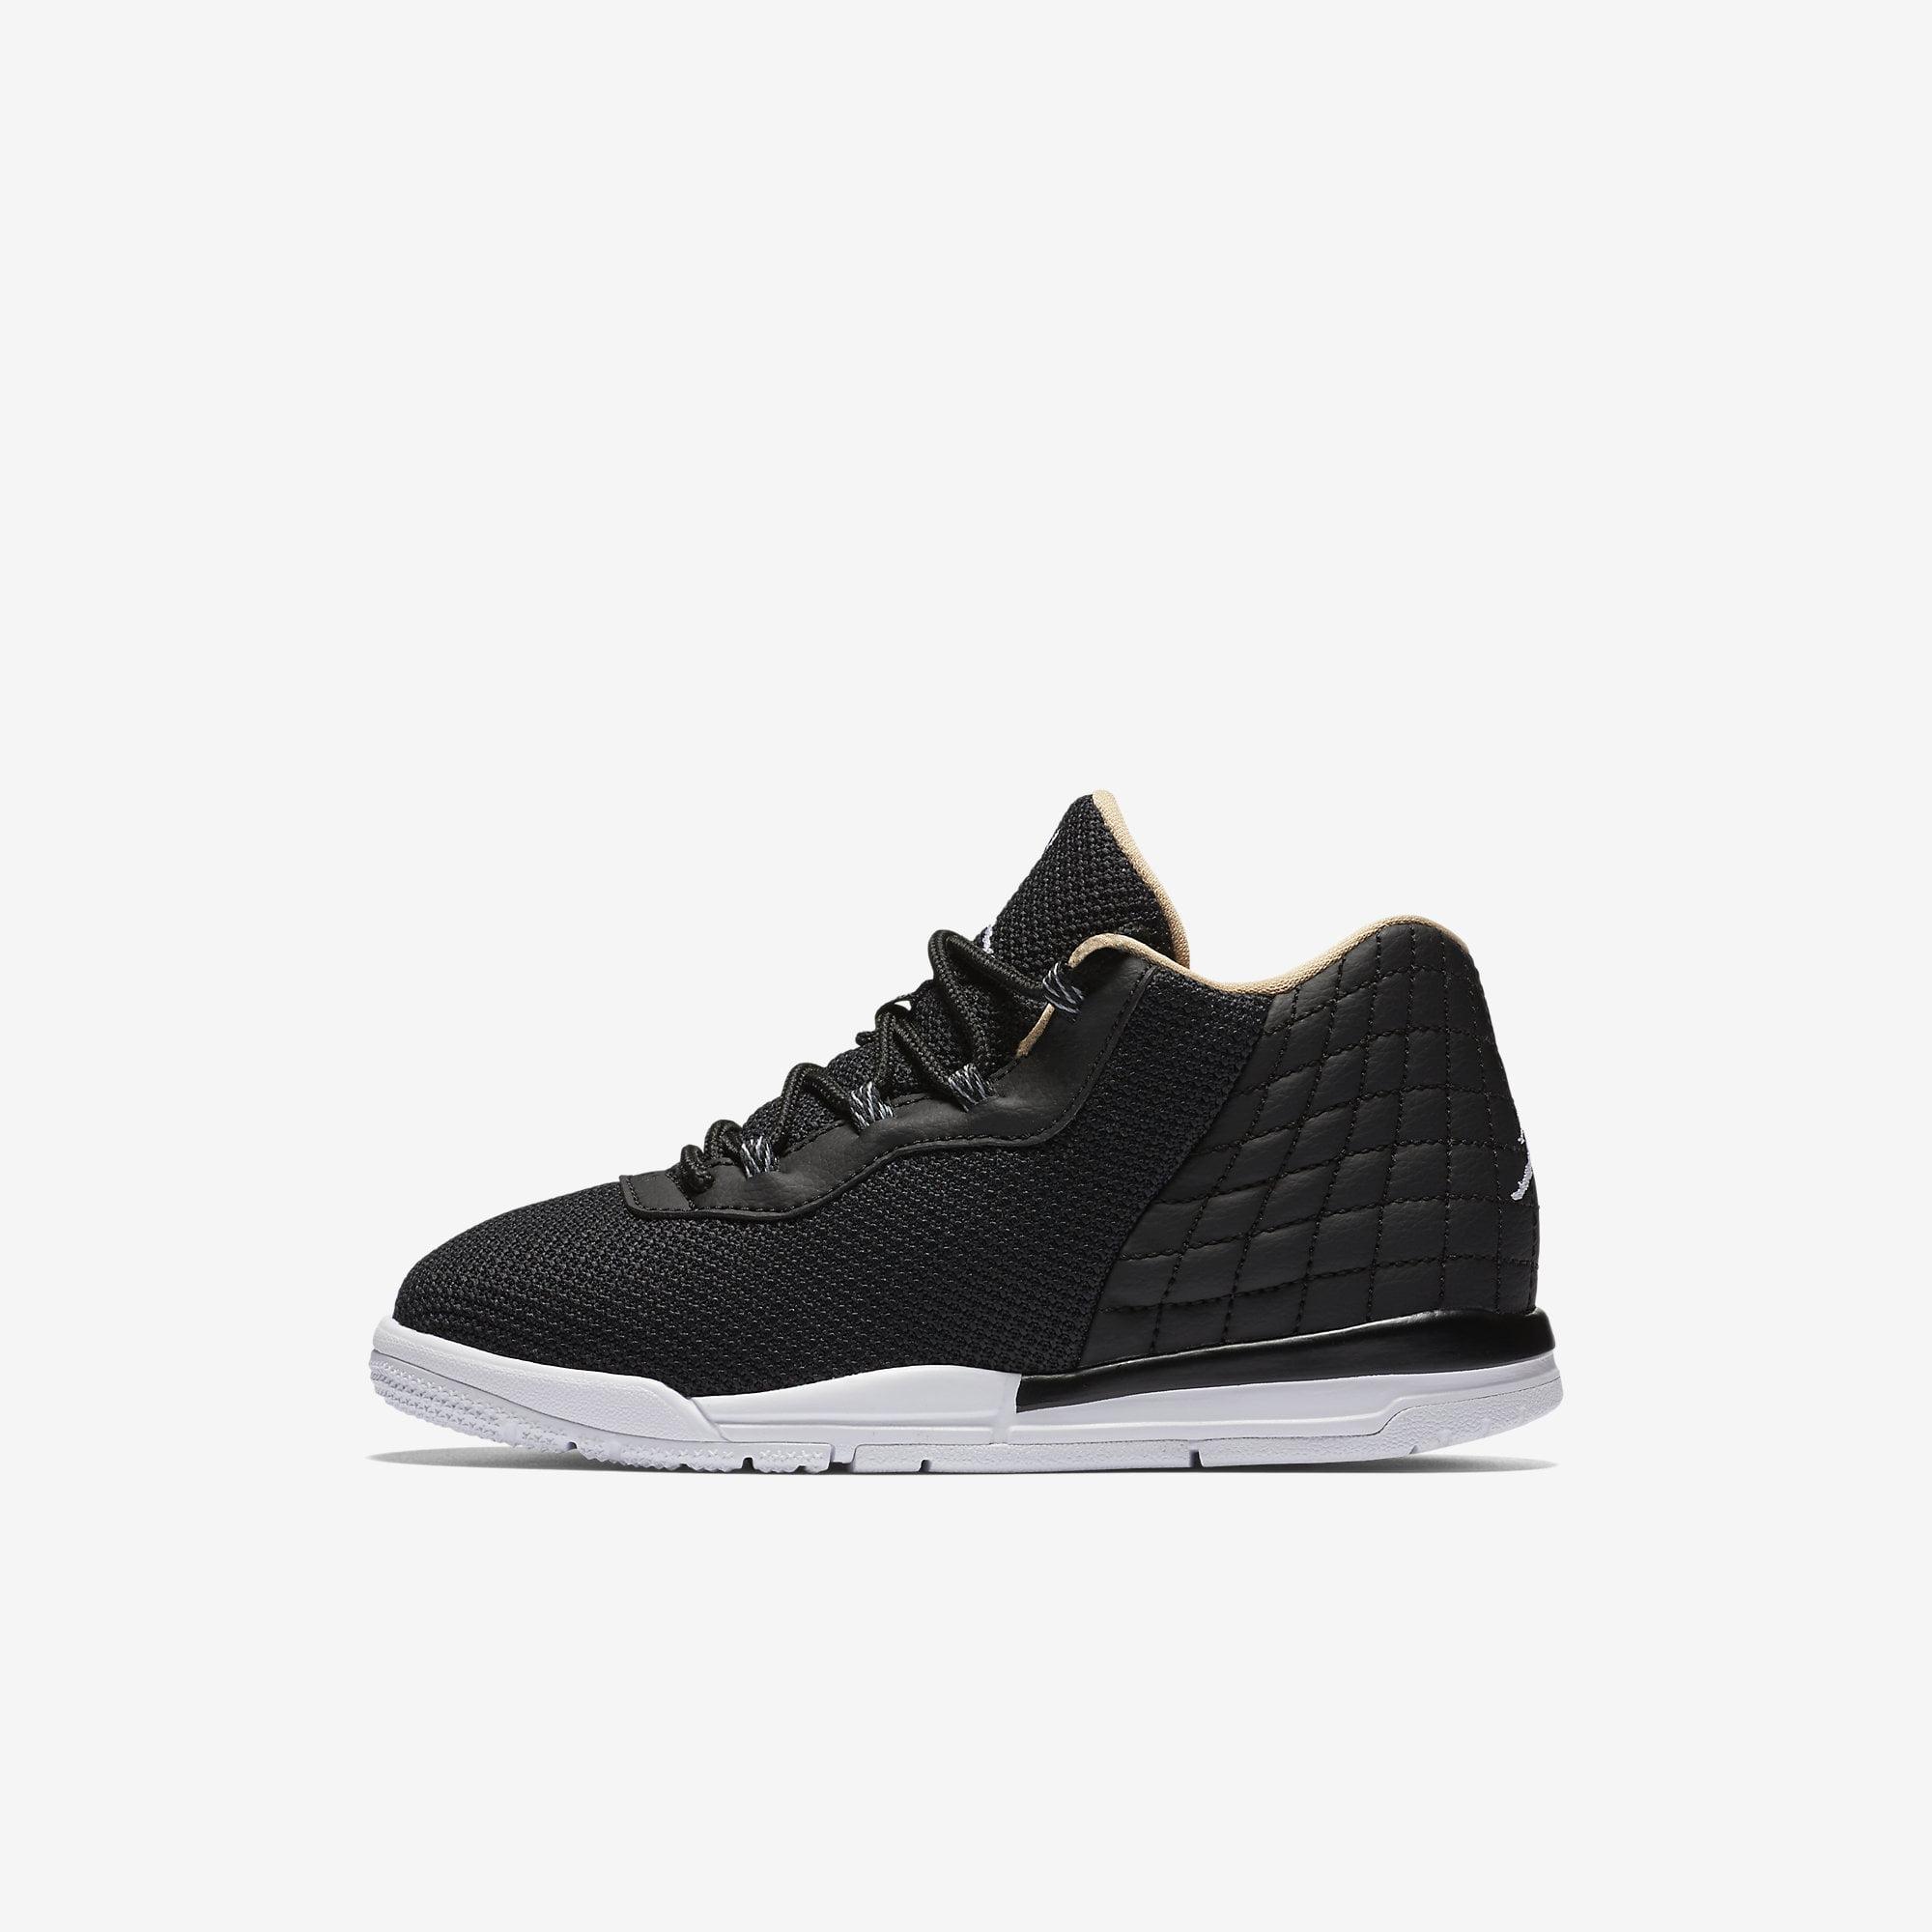 JORDAN ACADEMY BP Boys 844704-012 Economical, stylish, and eye-catching shoes